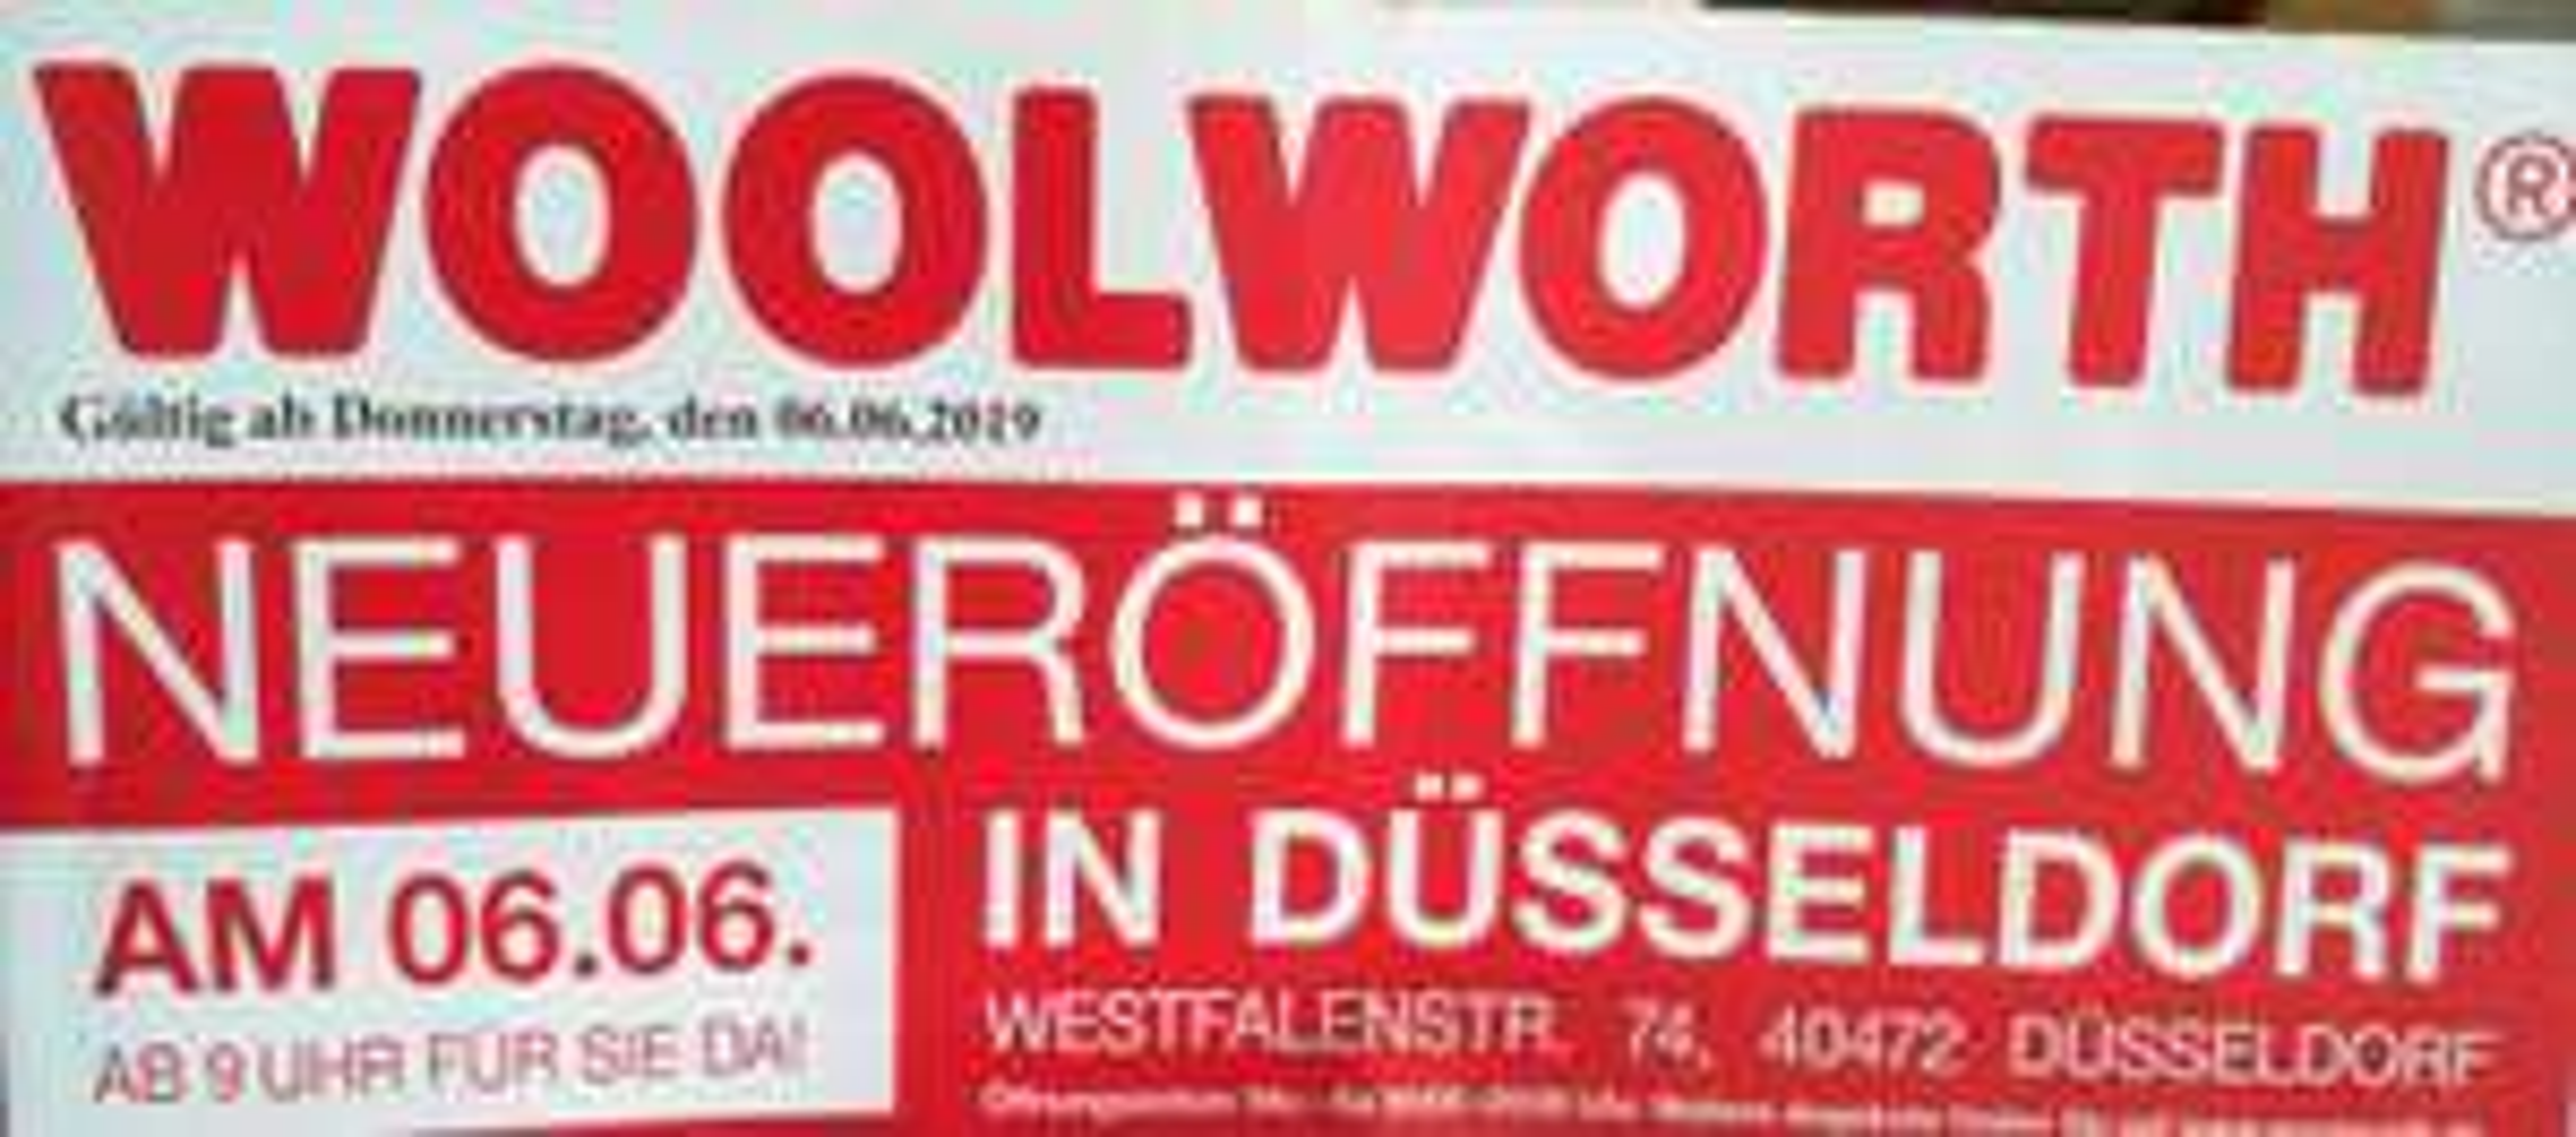 Bull Burner Hochtemperaturgrill Woolworth Neueröffnung Düsseldorf [lokal]